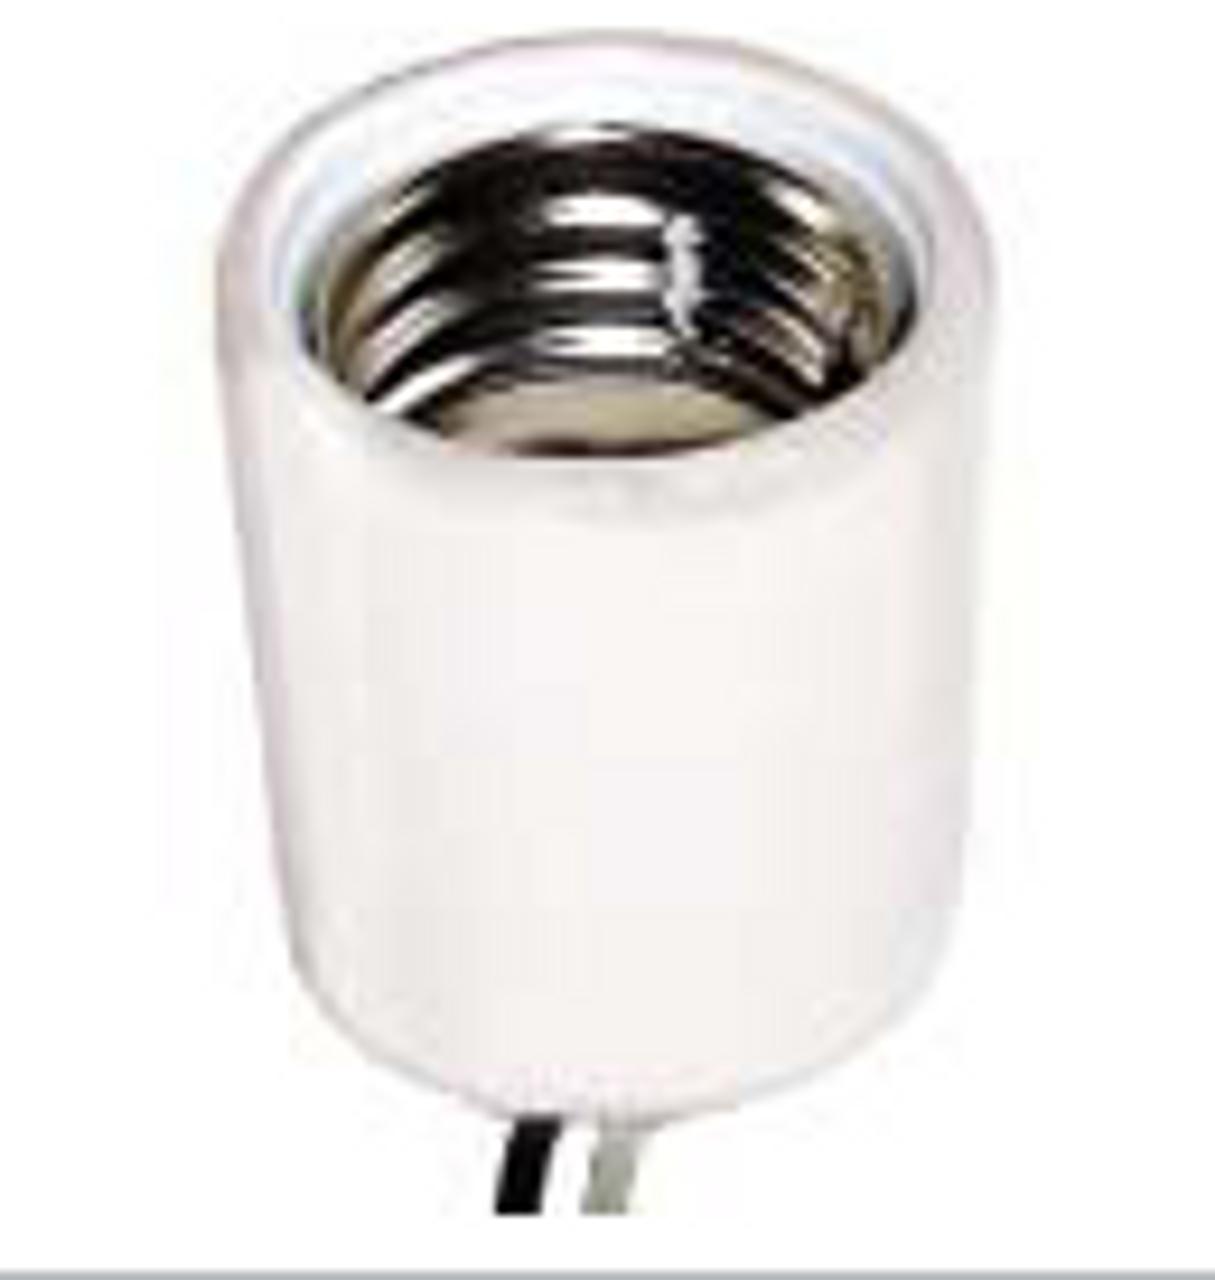 Mogul Porcelain Lampholder High Pressure Sodium Light Socket Bulk